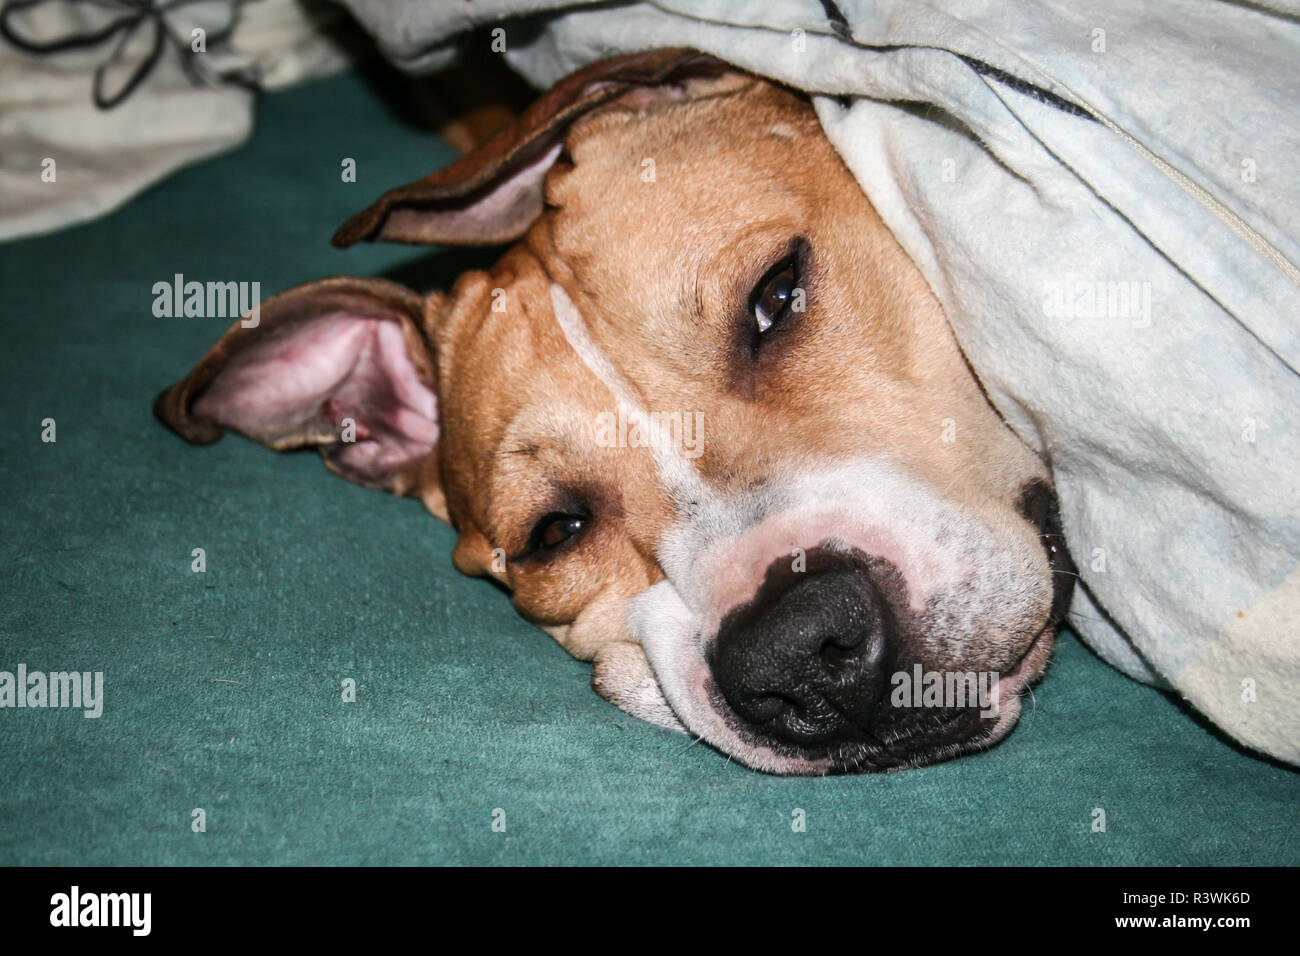 Spoiled dog sleeping under the blanket (American Pit Bull Terrier) - Stock Image